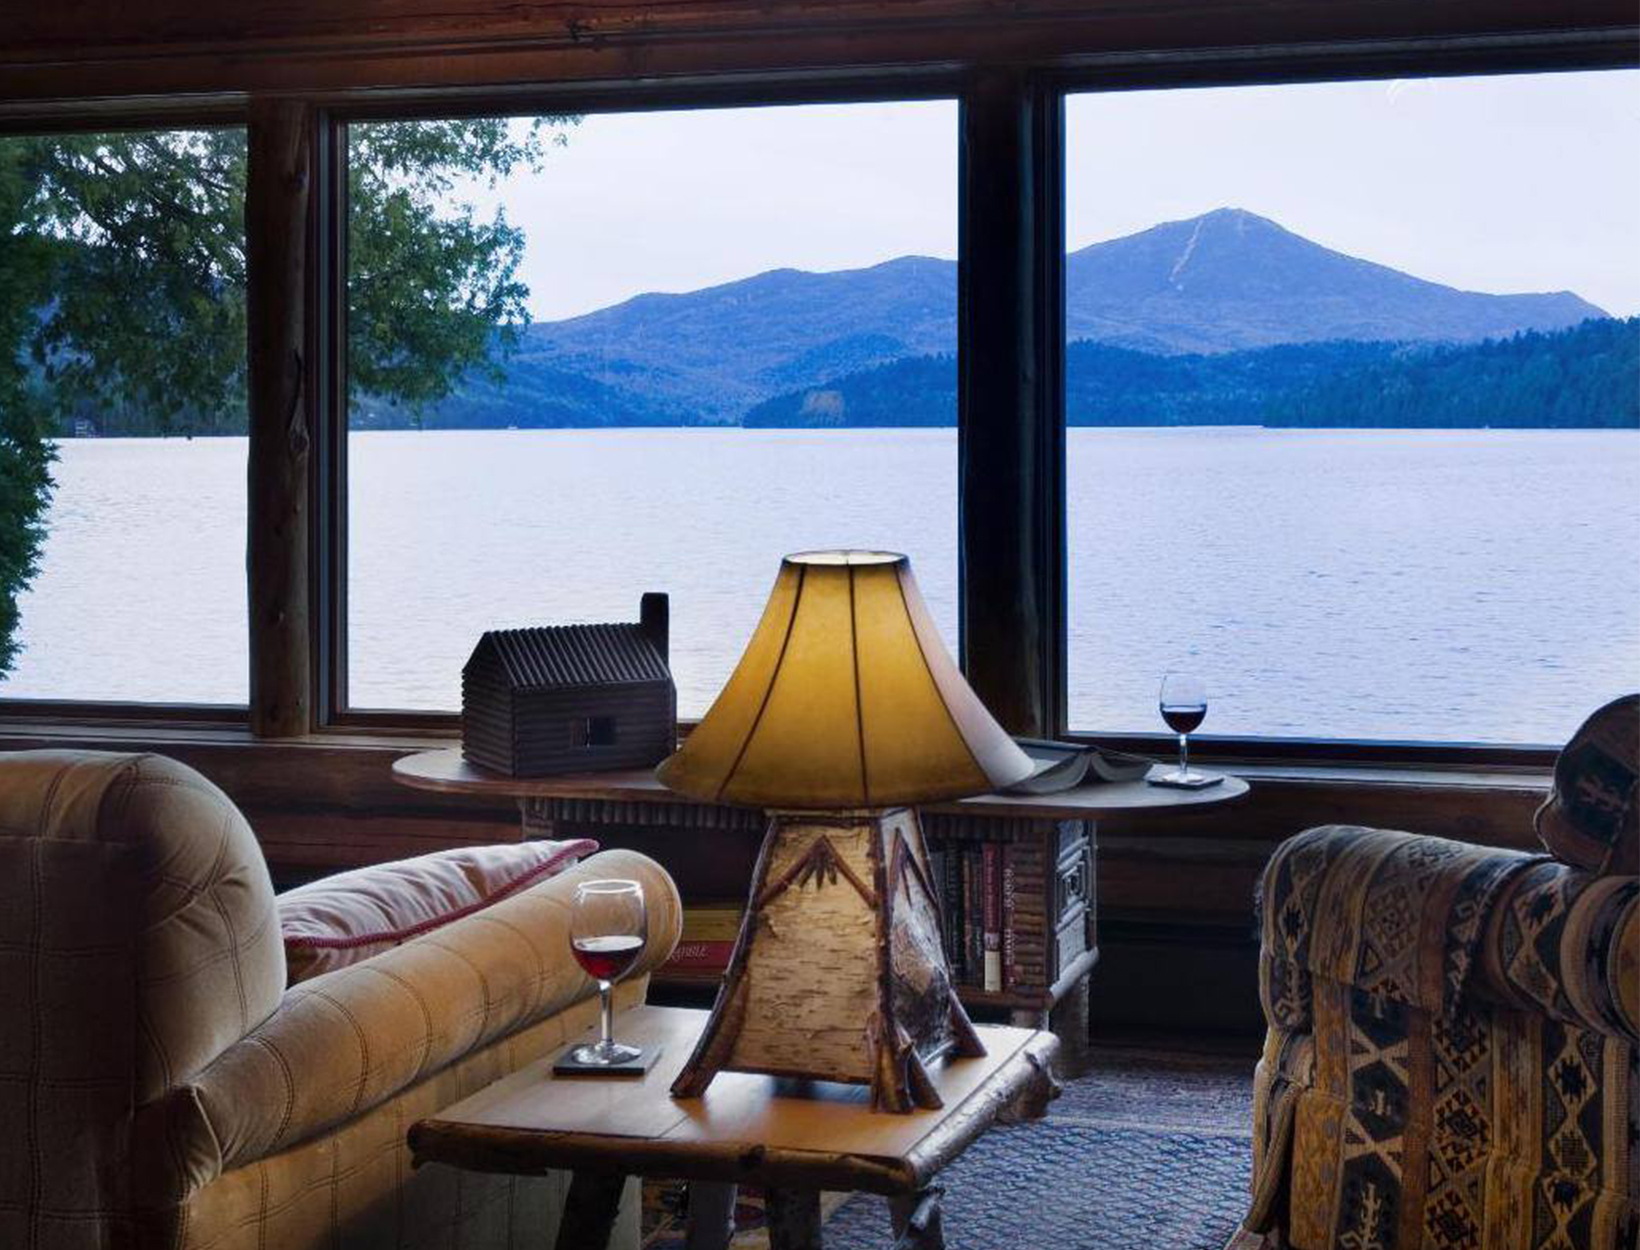 Lake Placid Lodge <br>Placid Gölü, New York</em>